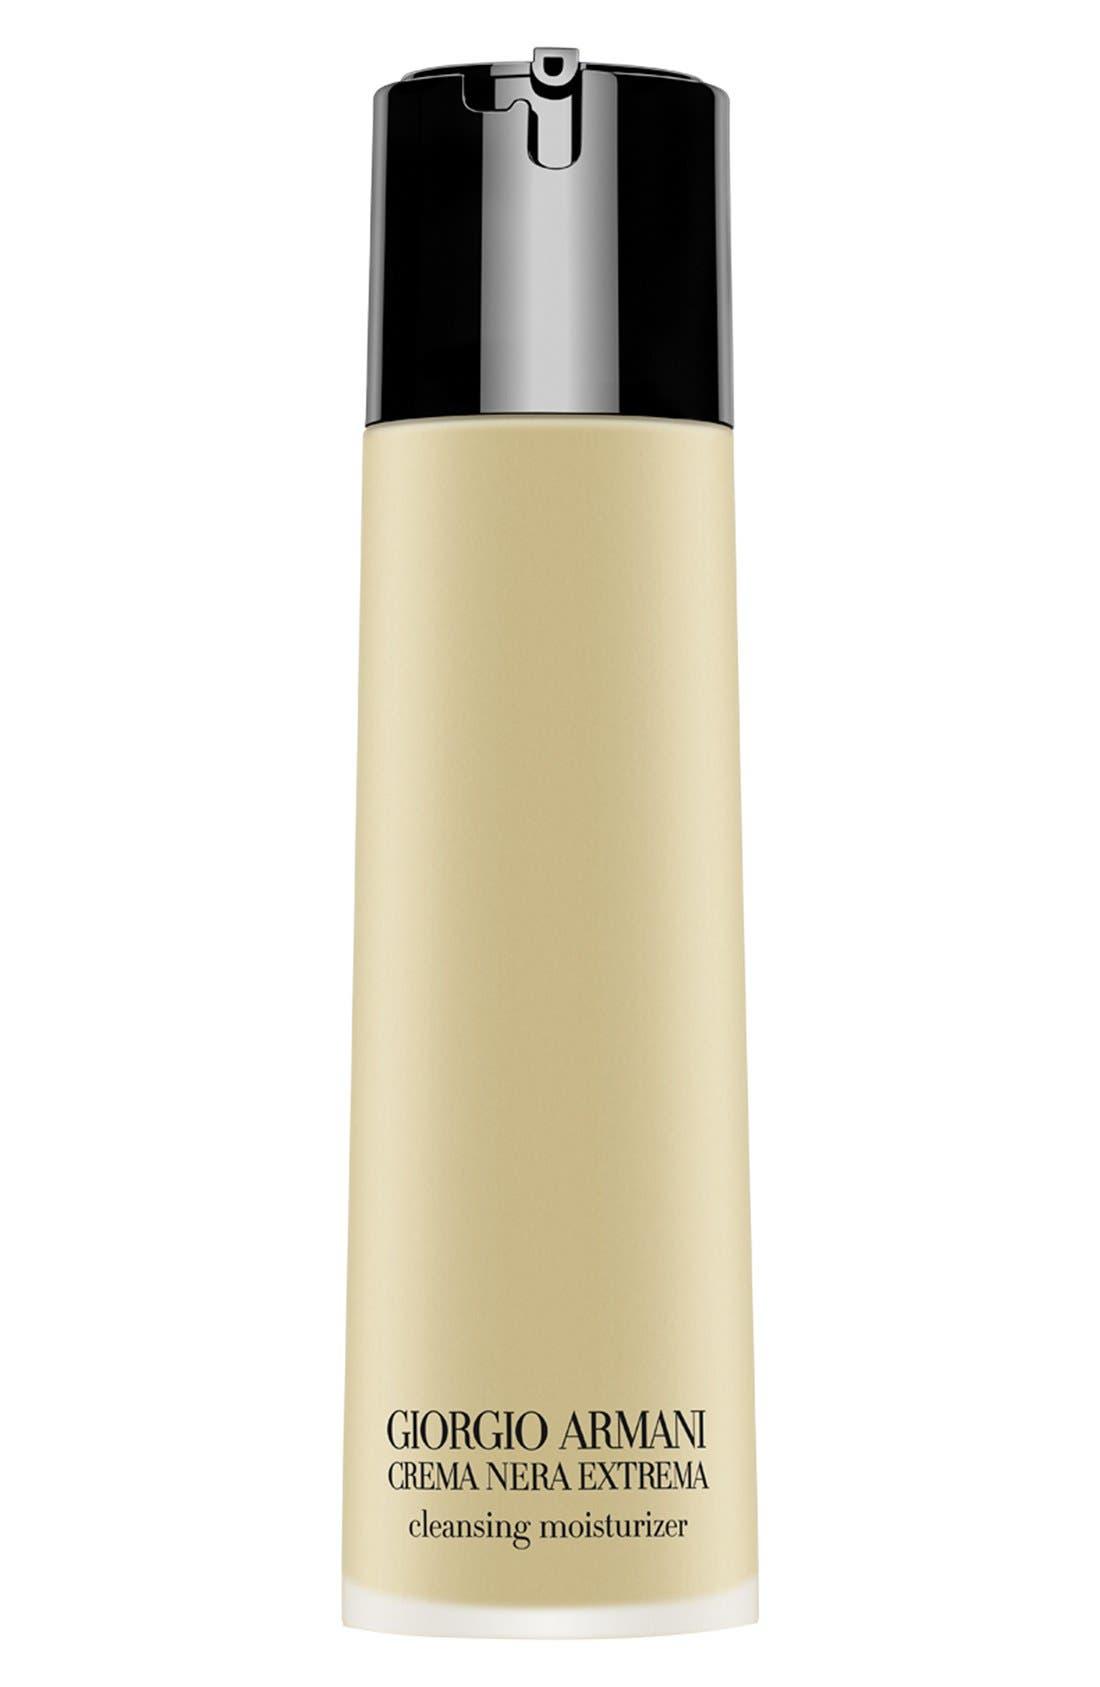 Giorgio Armani 'Crema Nera Extrema' Supreme Balancing Oil-in-Gel Cleansing Moisturizer